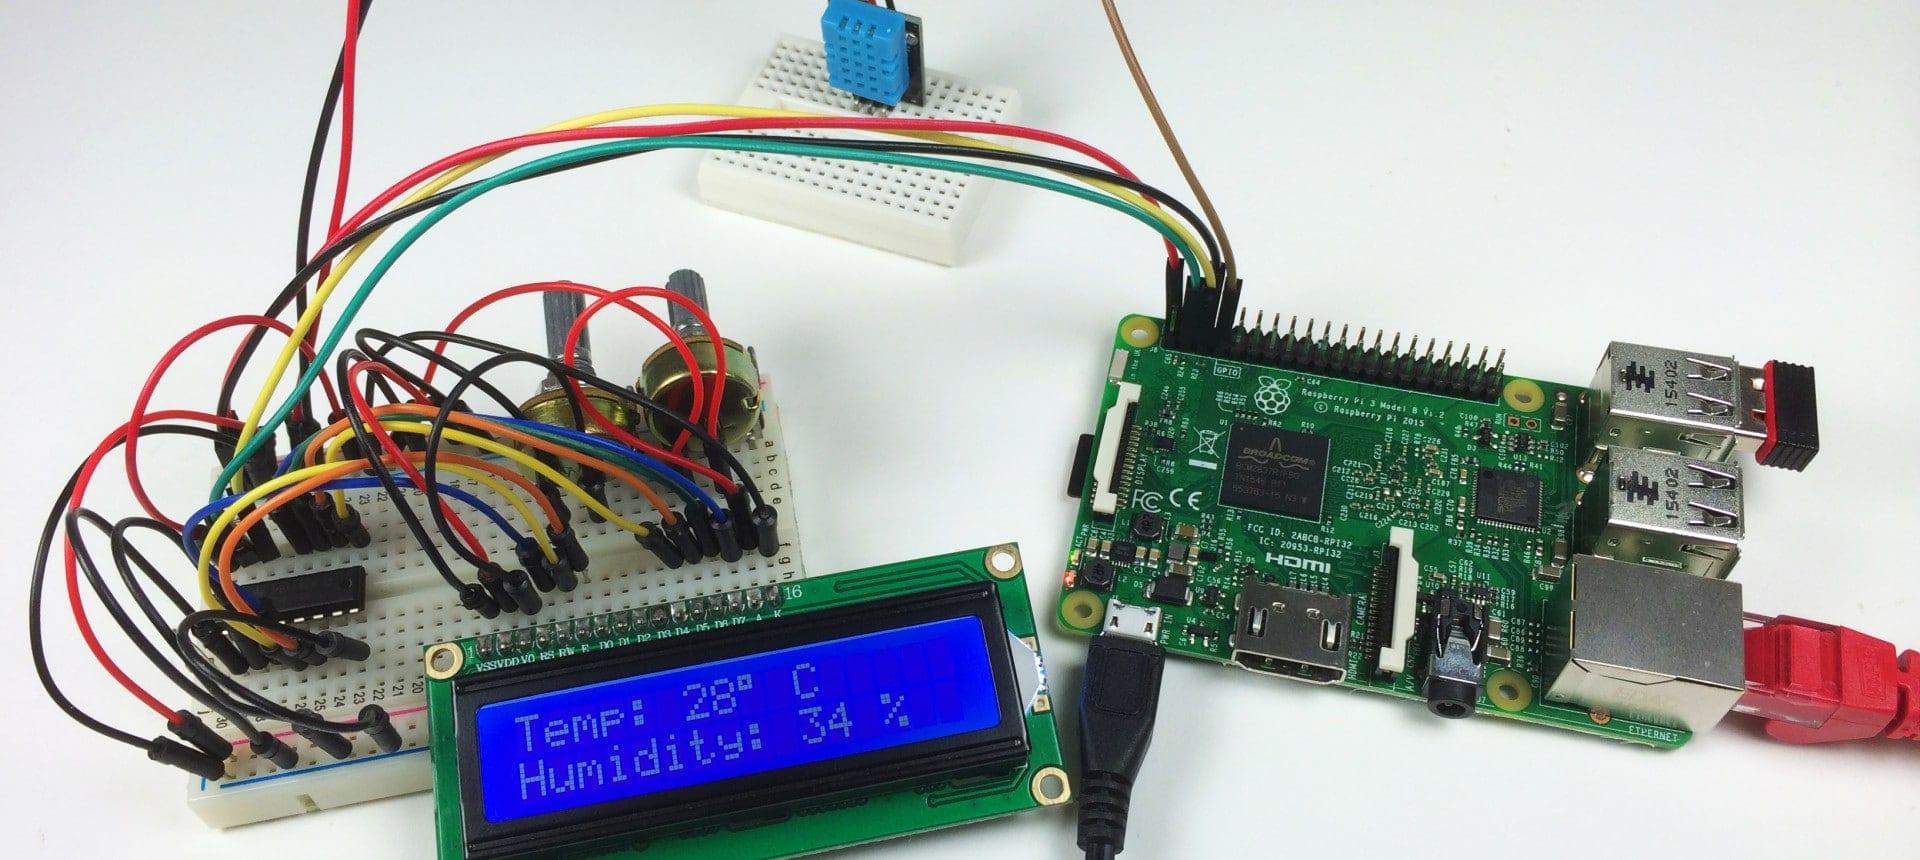 How to Setup an I2C LCD on the Raspberry Pi - Circuit Basics